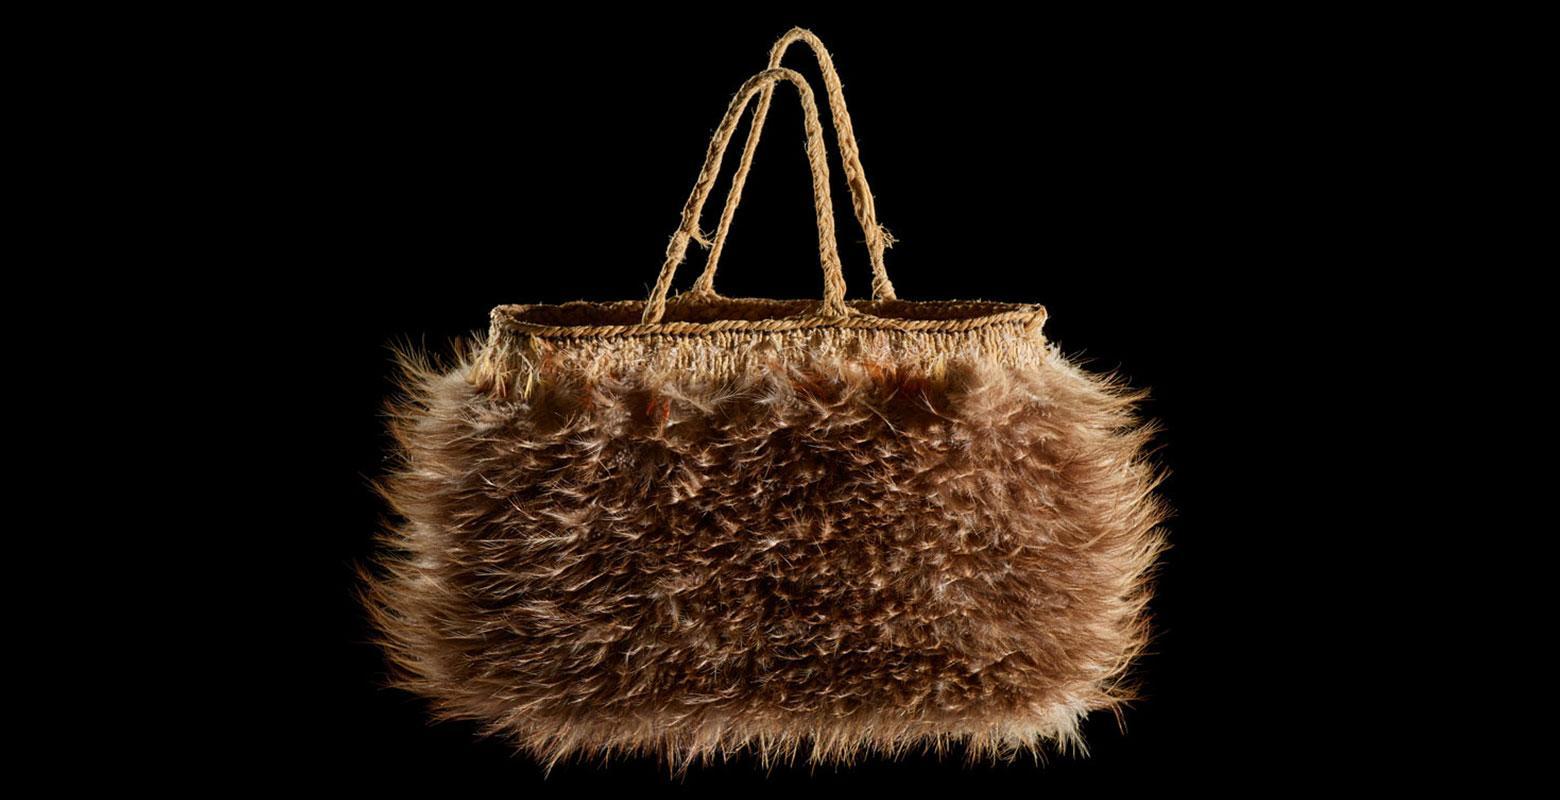 Bag made of kiwi feathers